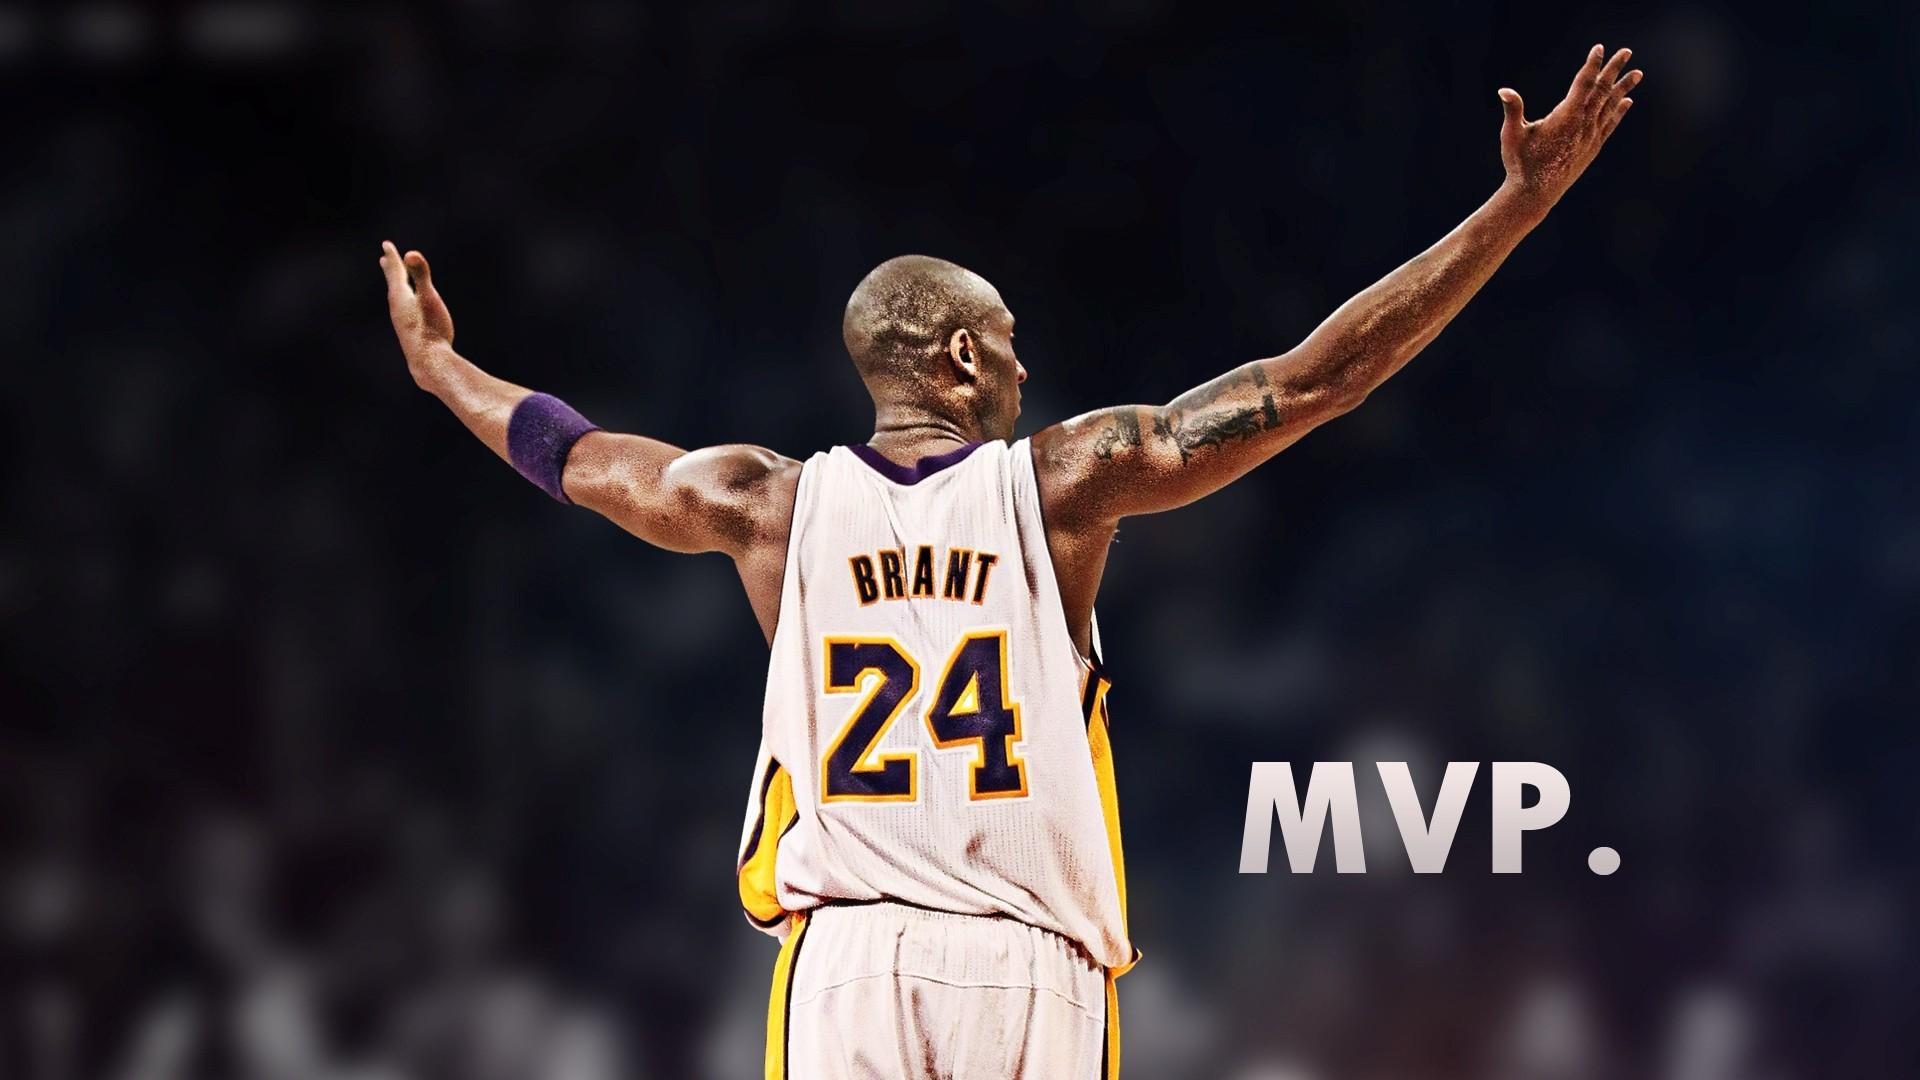 Download Kobe Bryant Hd Wallpaper For Desktop And Mobiles Iphone 7